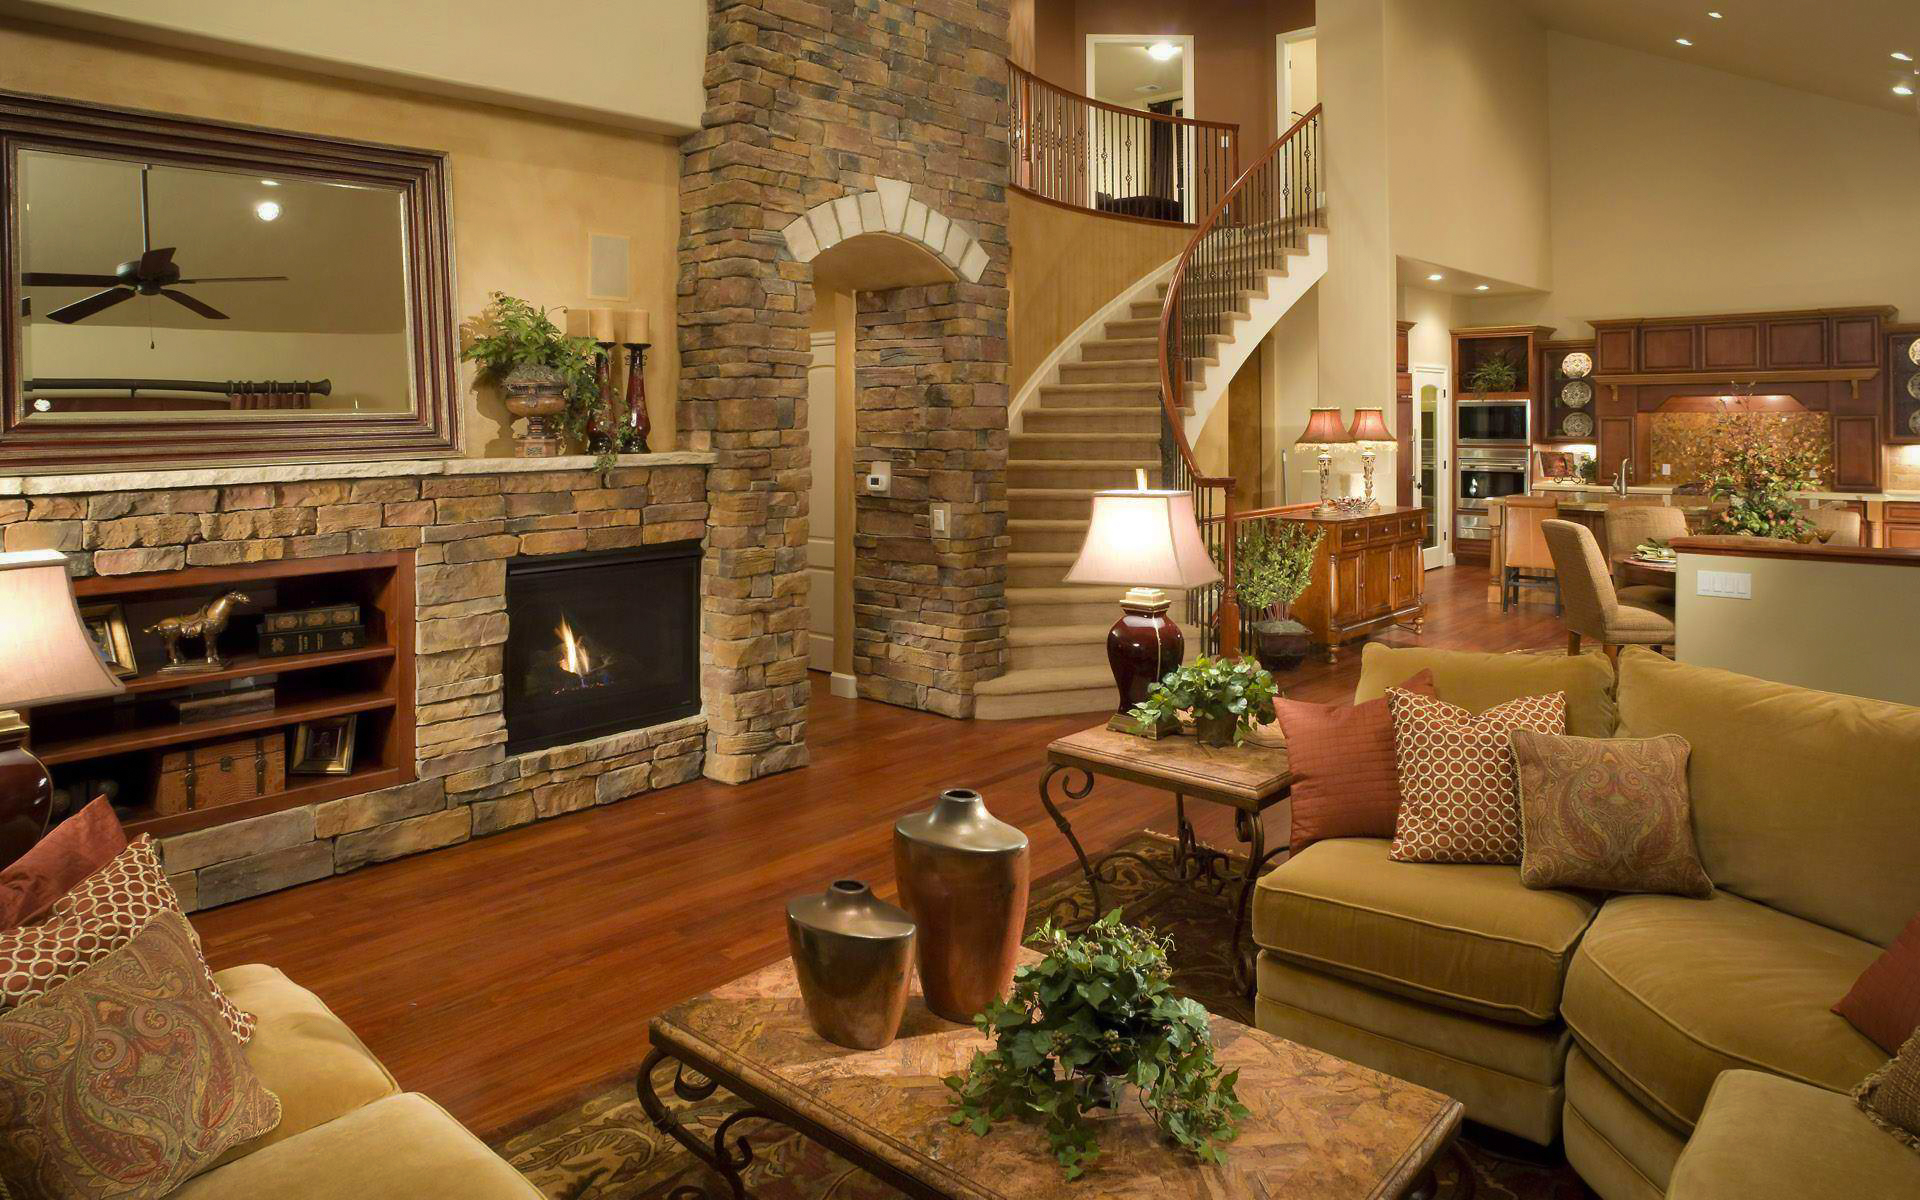 beautiful-home-interior-design-beautiful-home-interior-design.jpg